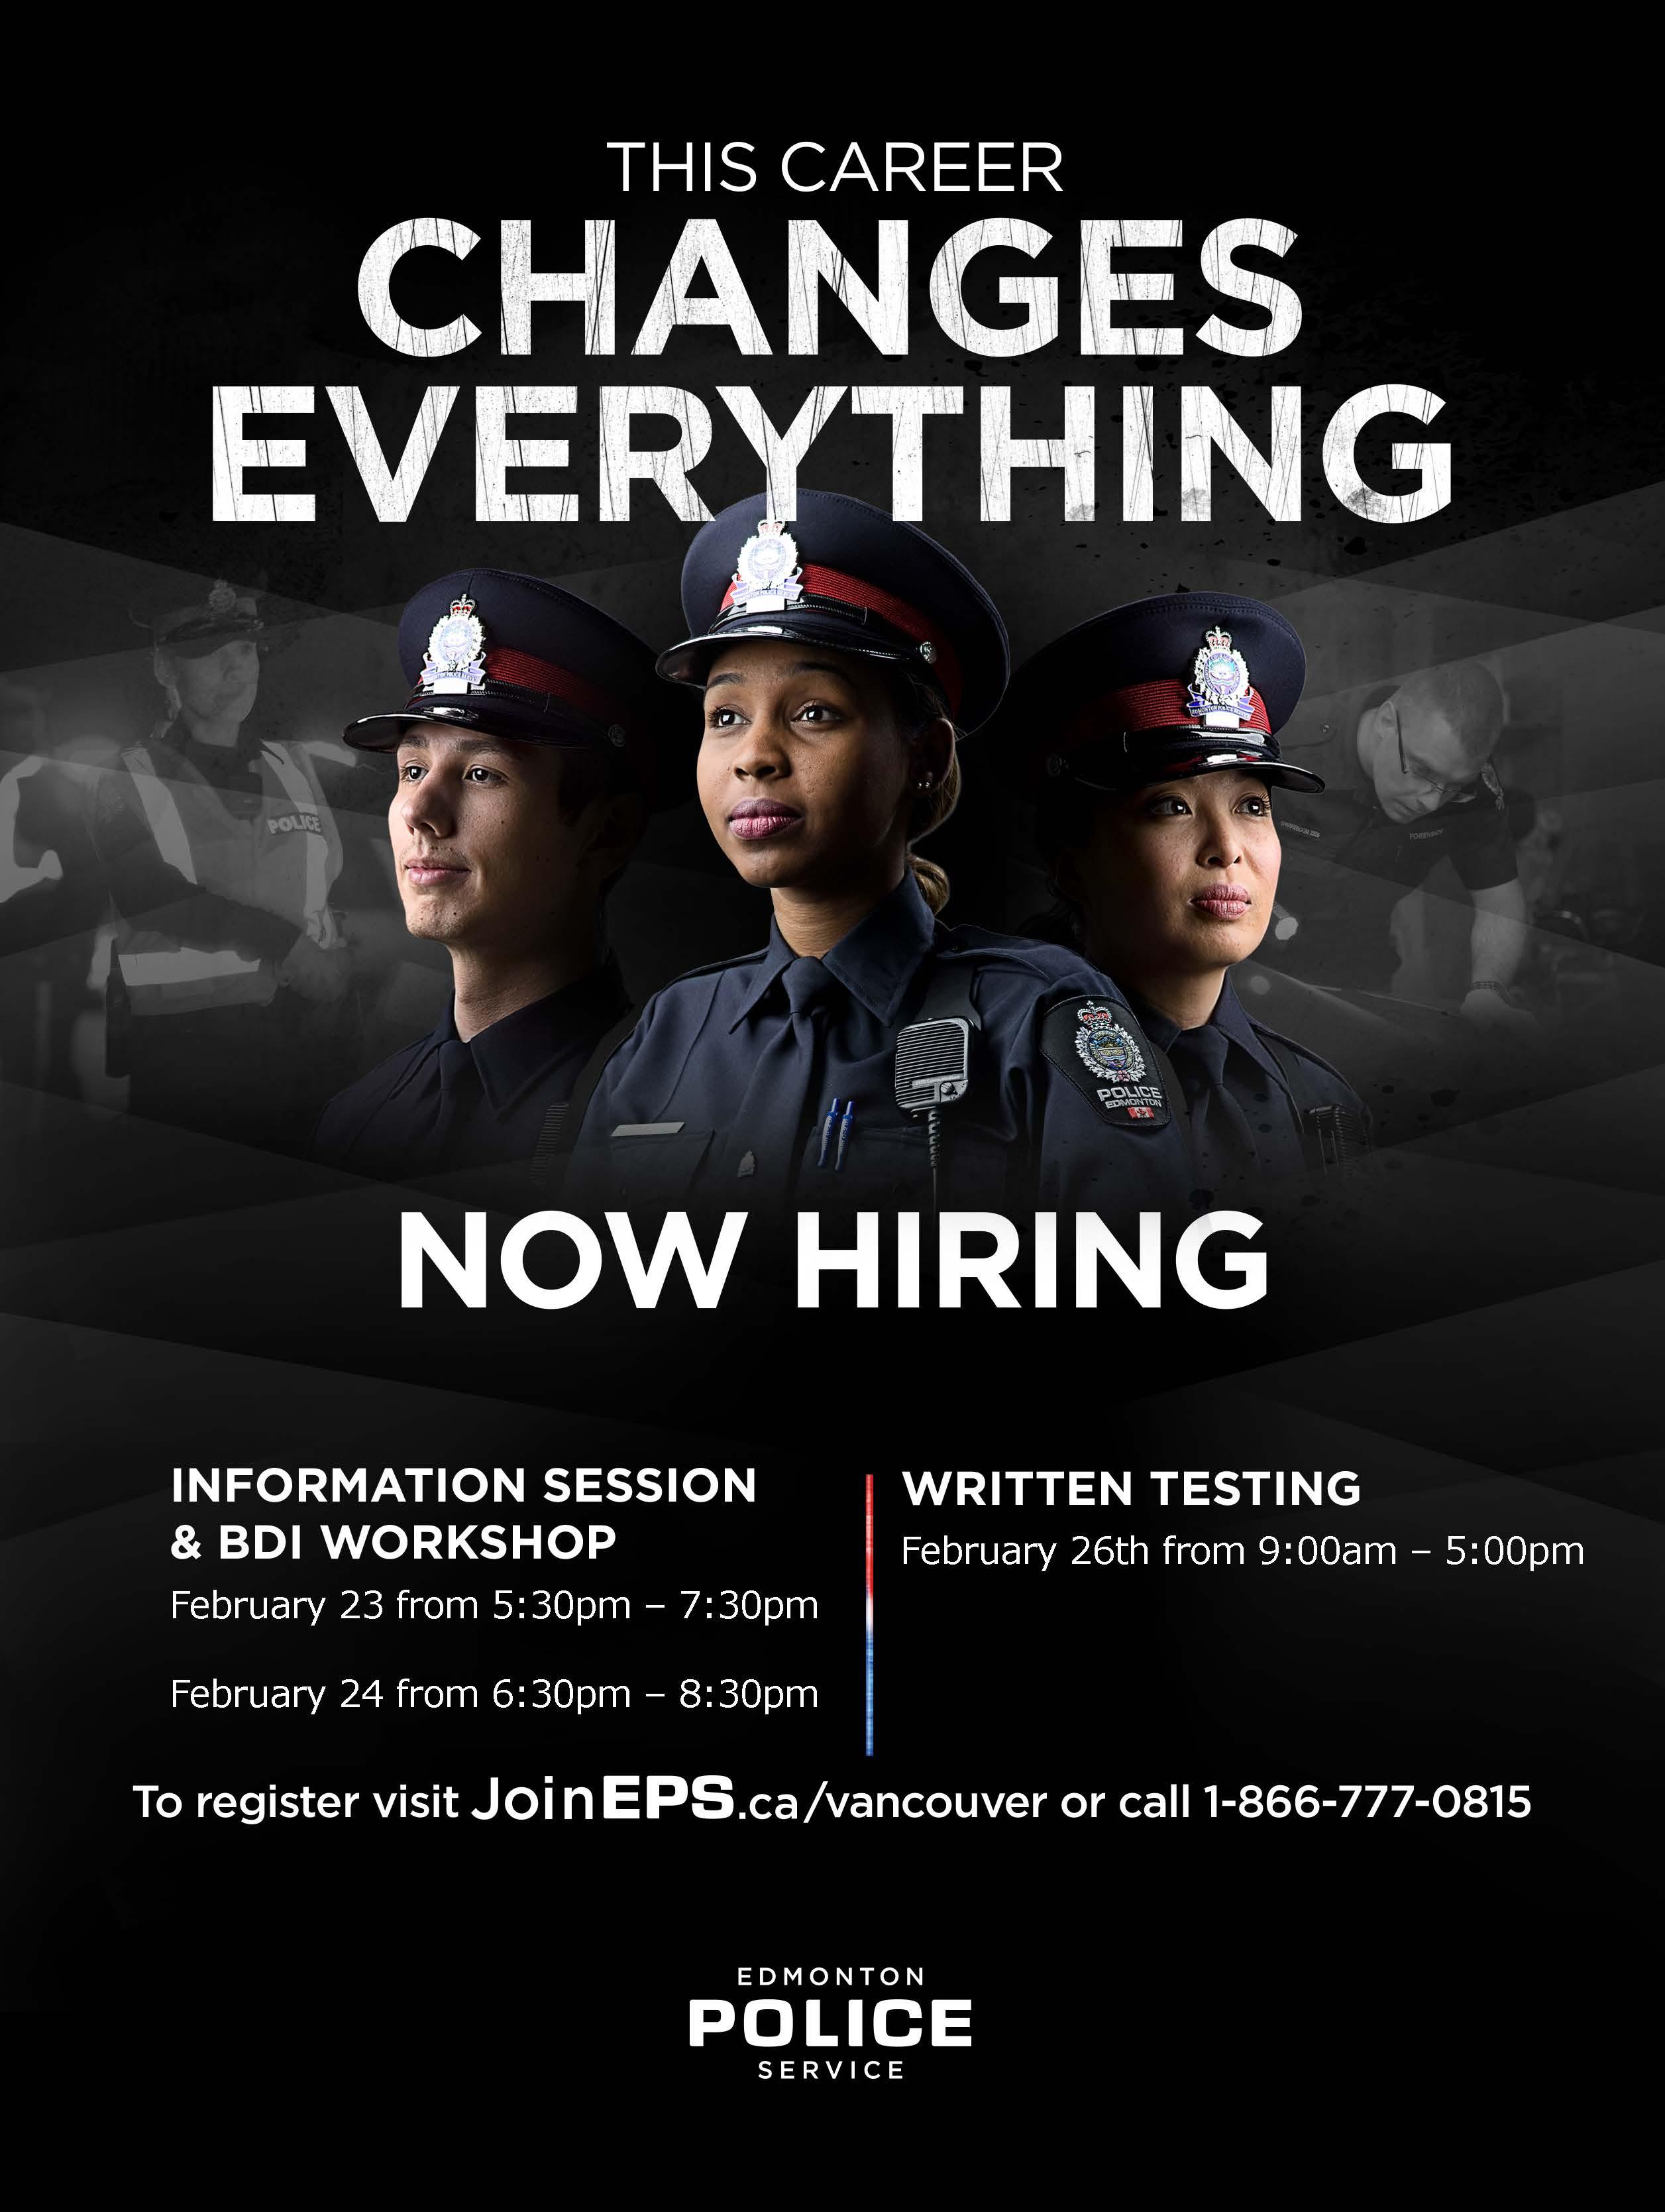 Edmonton Police Service Now Hiring